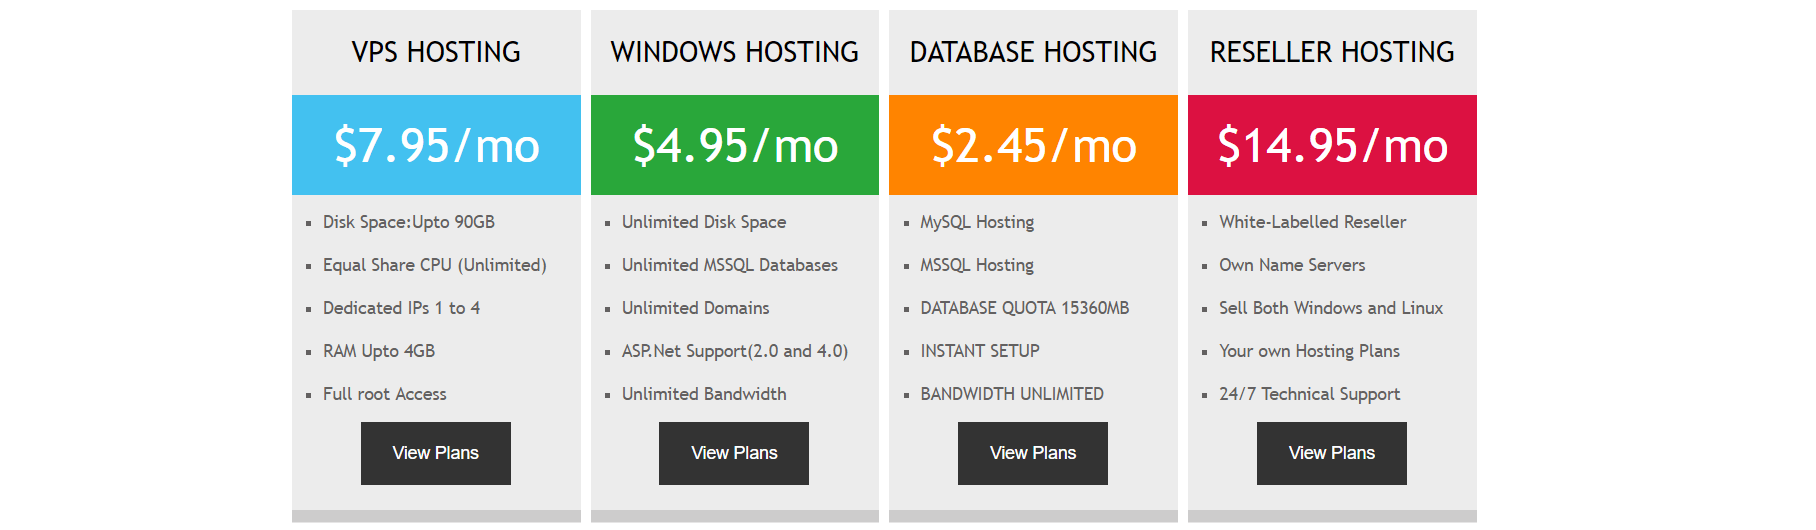 host-department-features